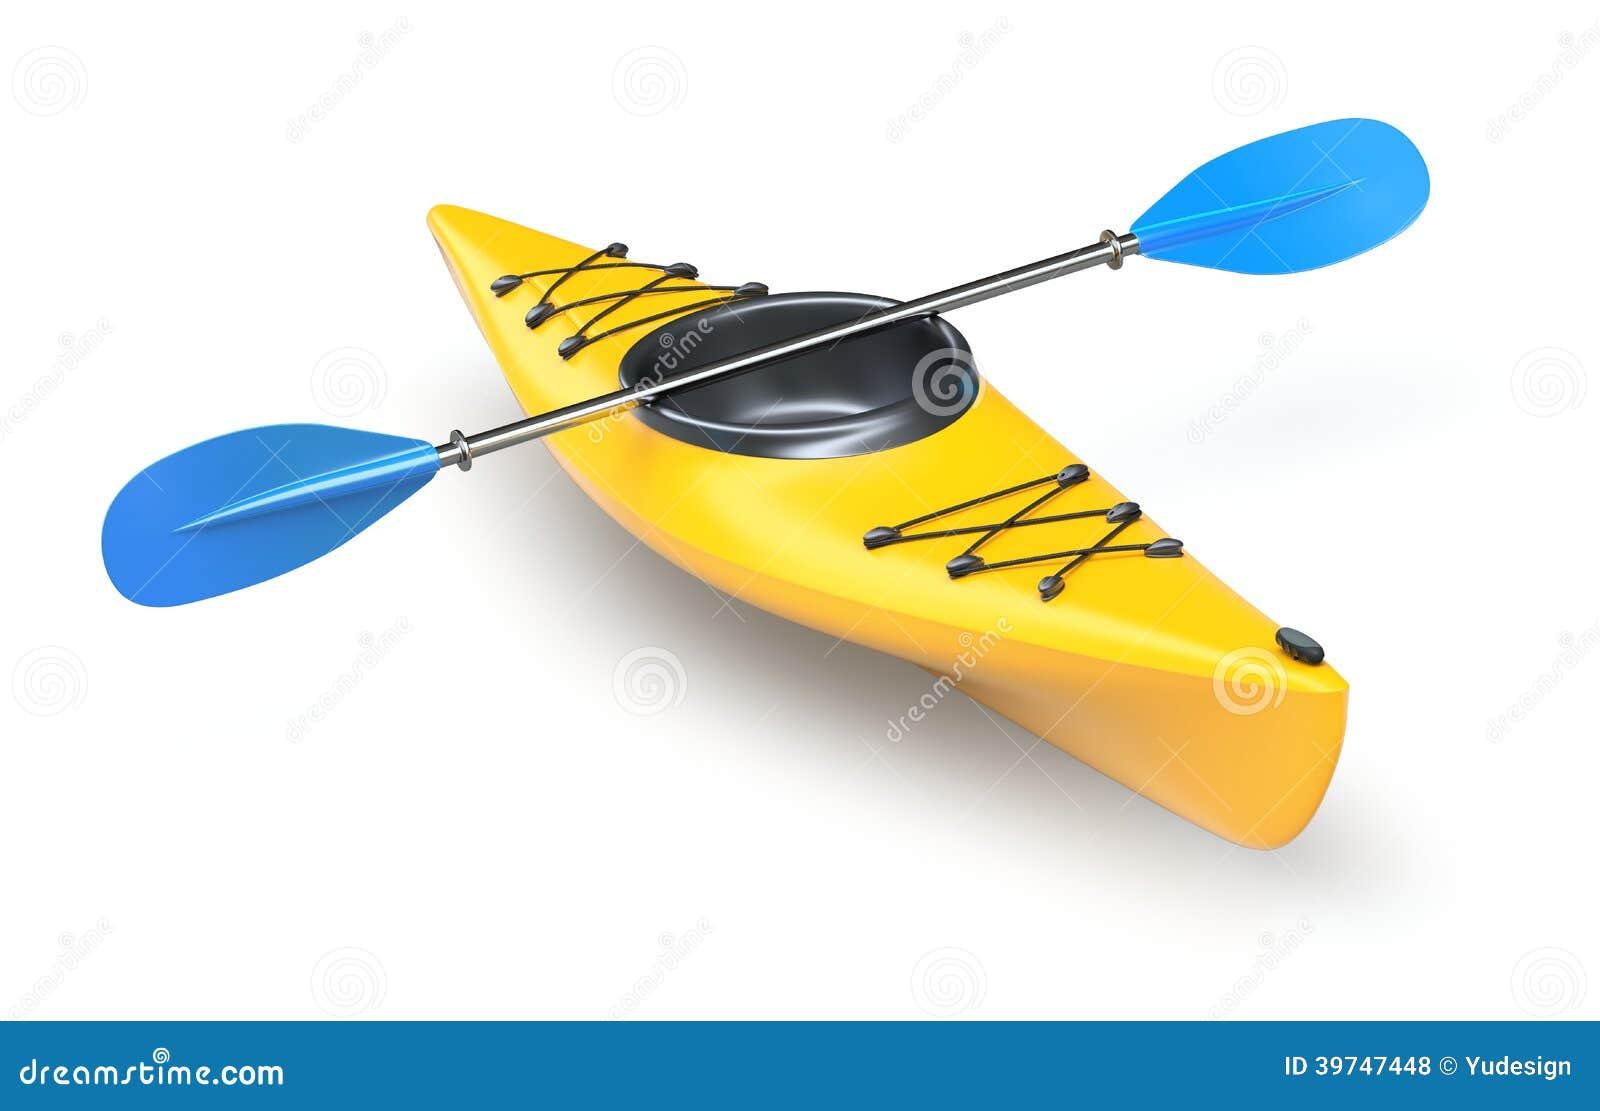 kayak clip art images - photo #22